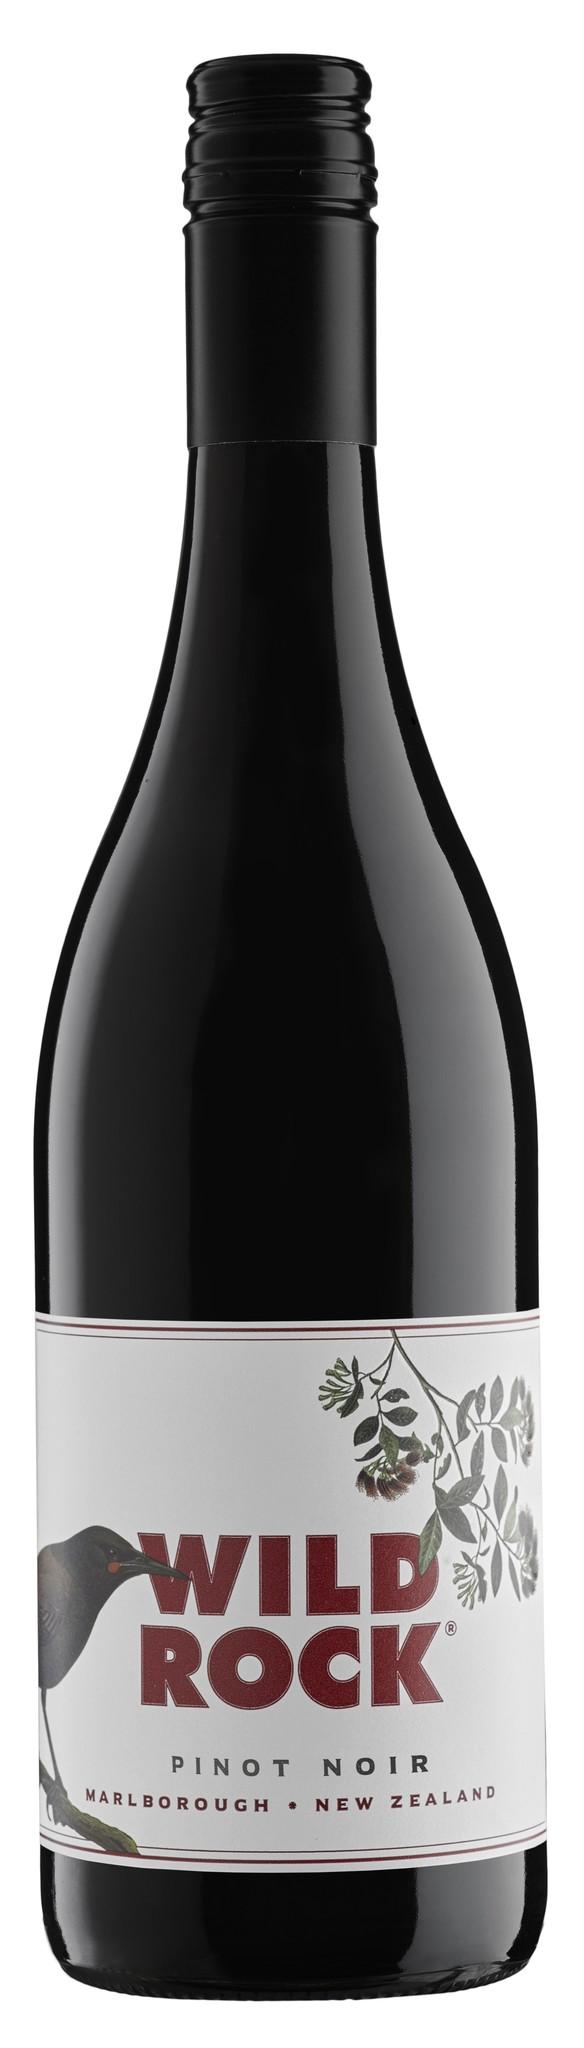 Wild Rock Wild Rock Pinot Noir